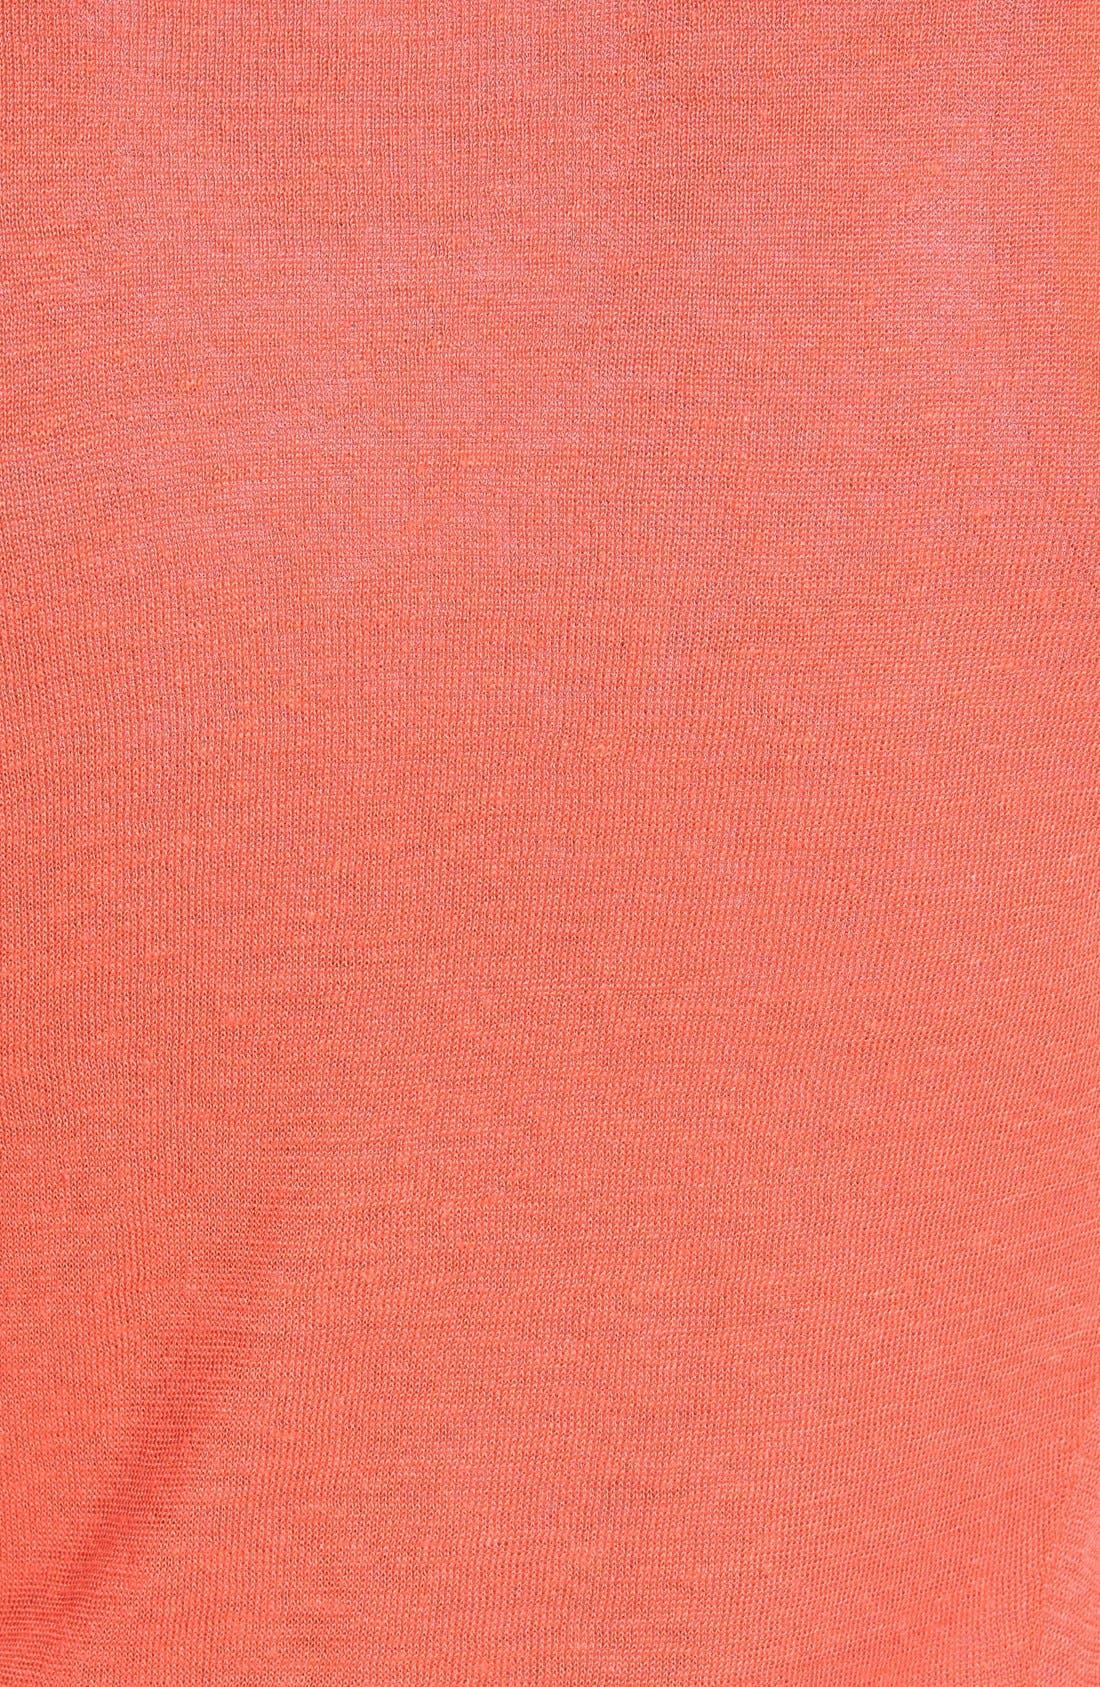 4-Way Convertible Lightweight Cardigan,                             Alternate thumbnail 375, color,